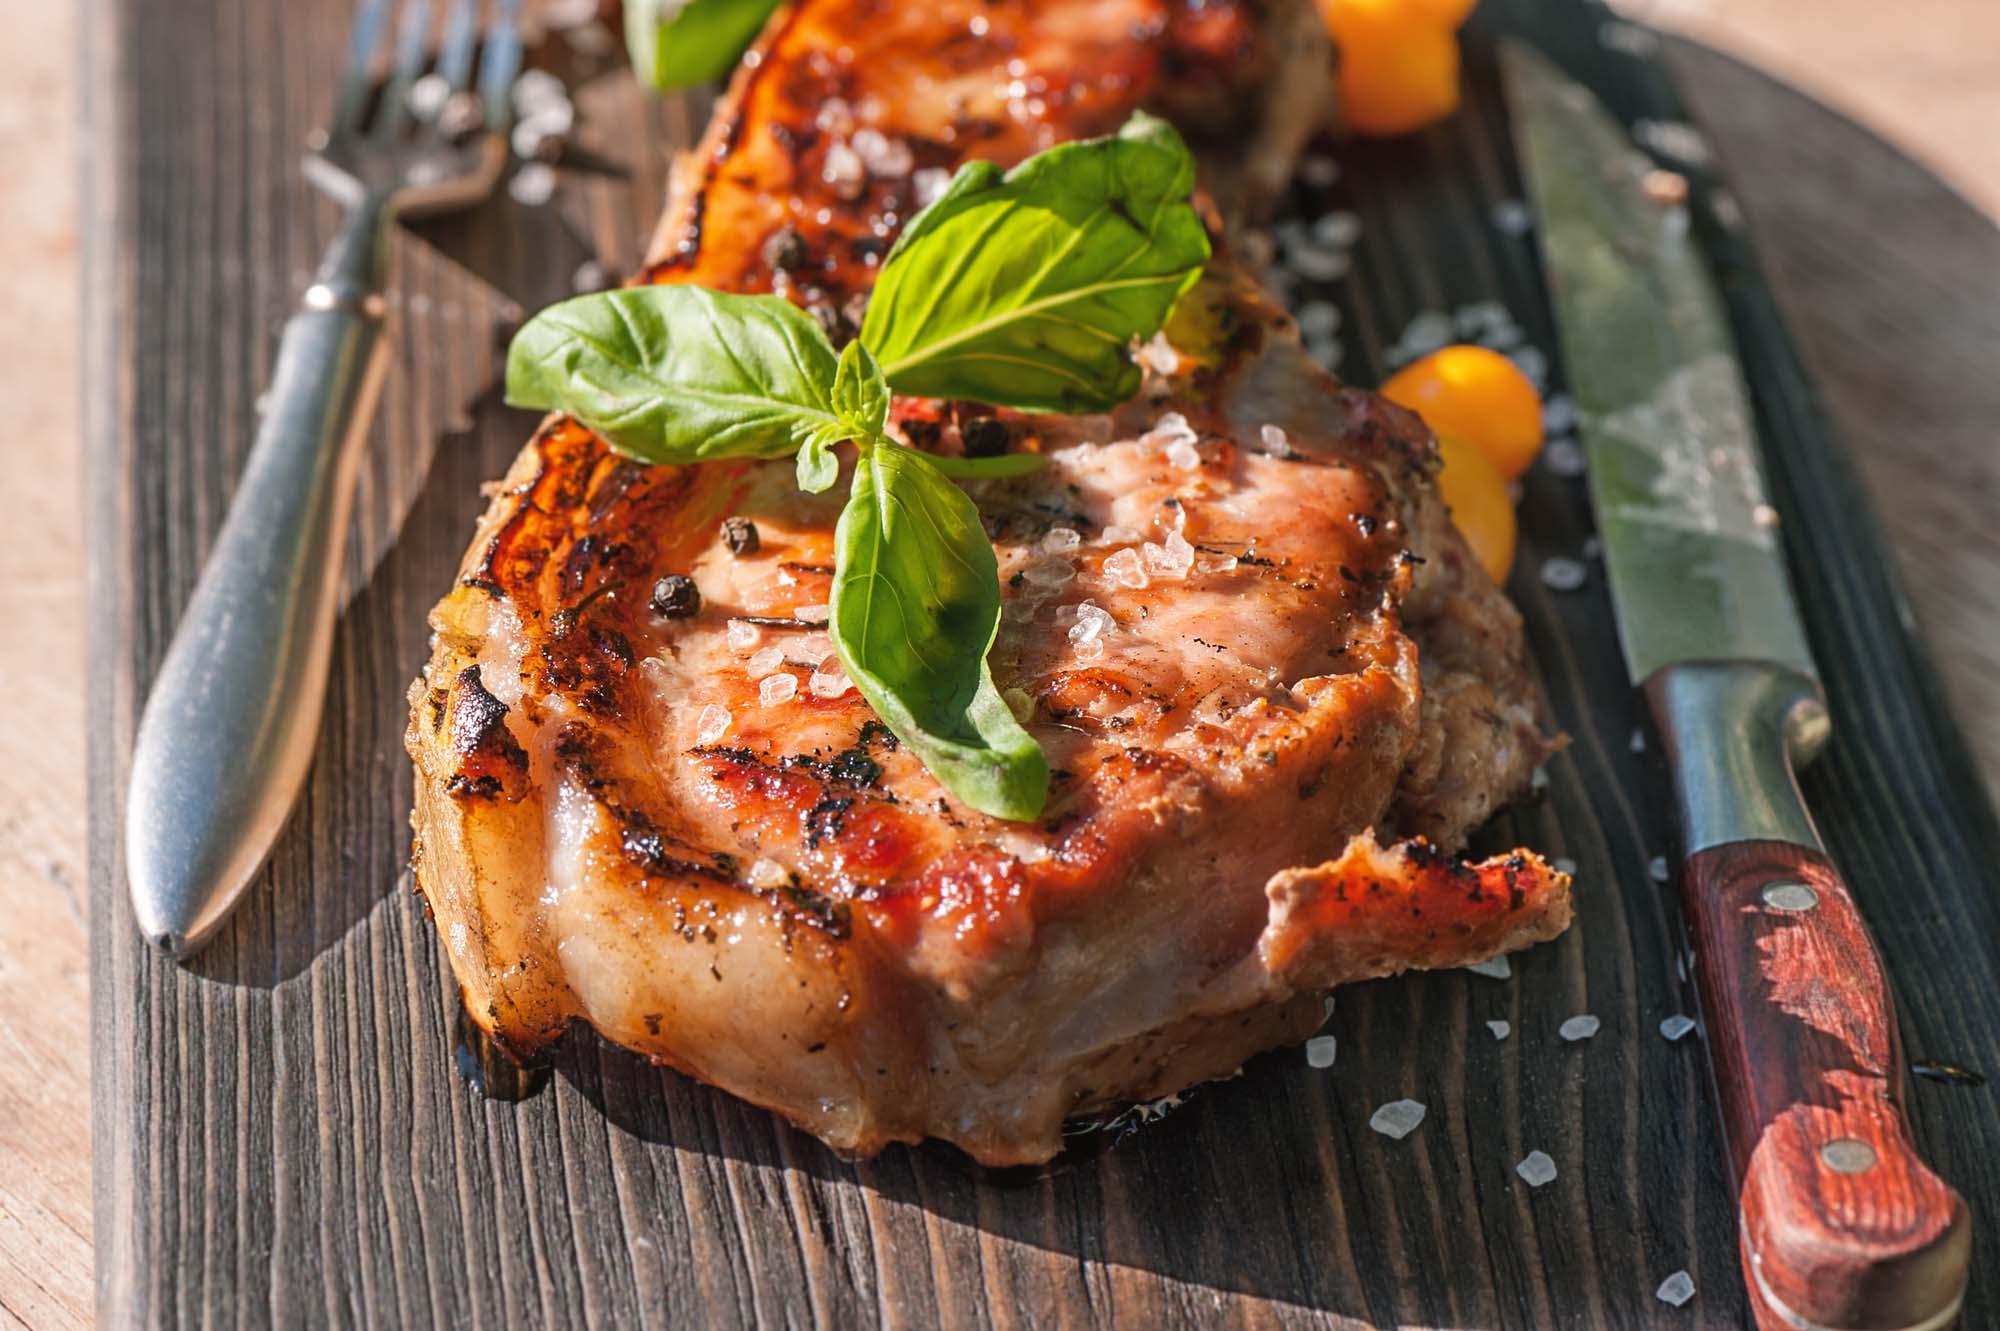 Grillede svinekoteletter med italiensk marinade